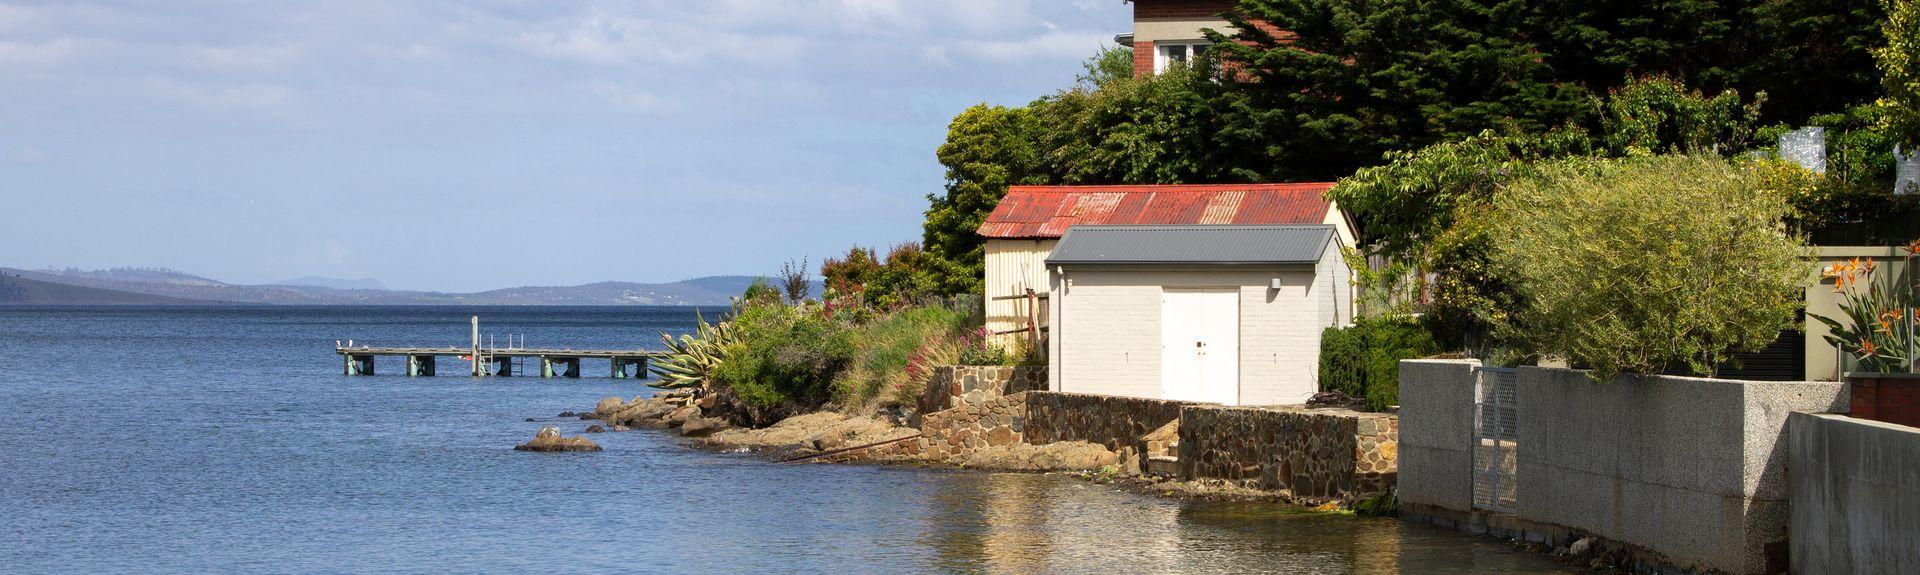 Sandy Bay, Hobart, Tasmania, Australia